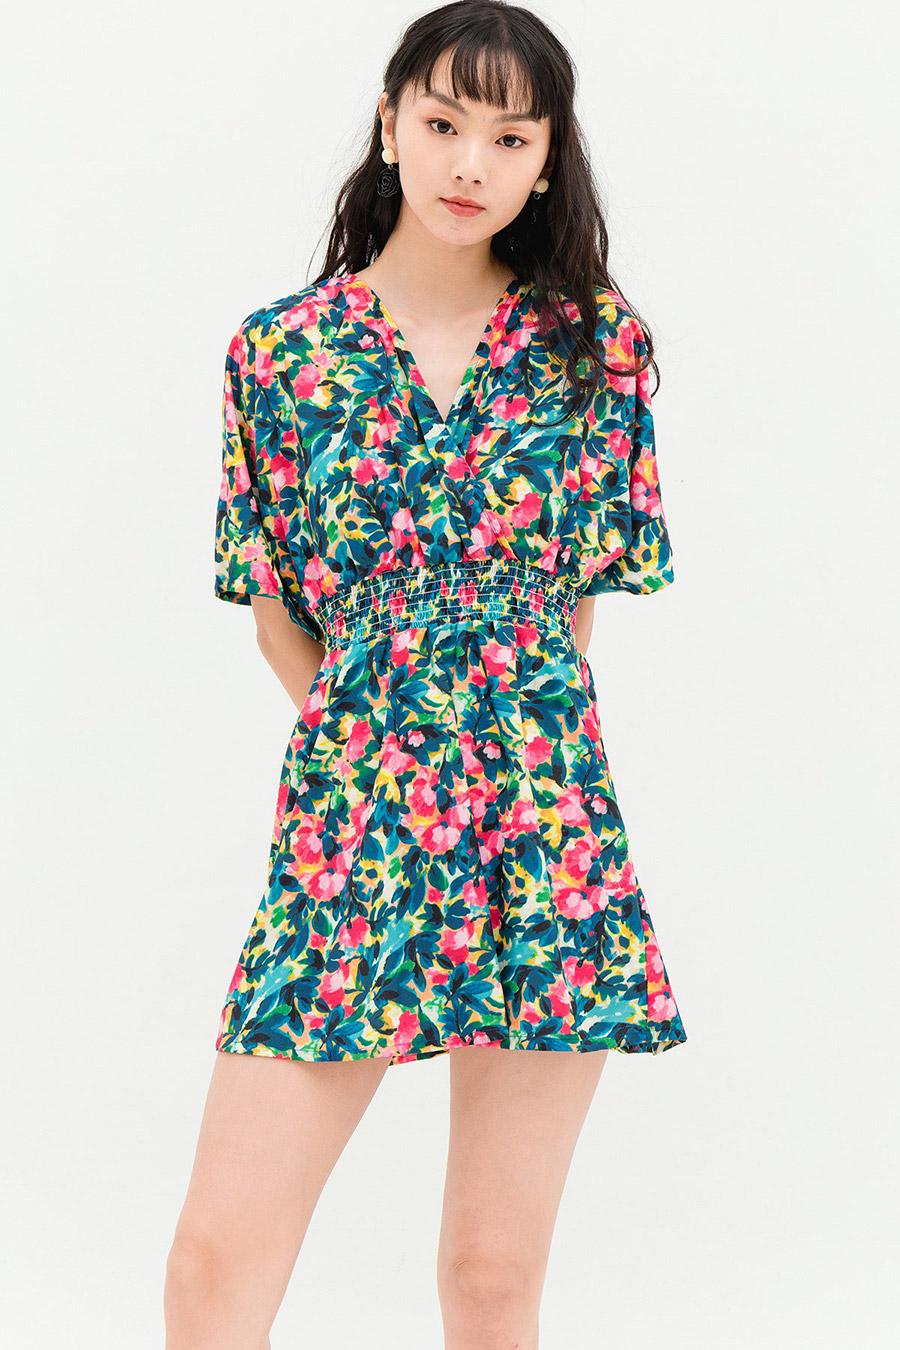 LEAH DRESS - CAPRI FLEUR